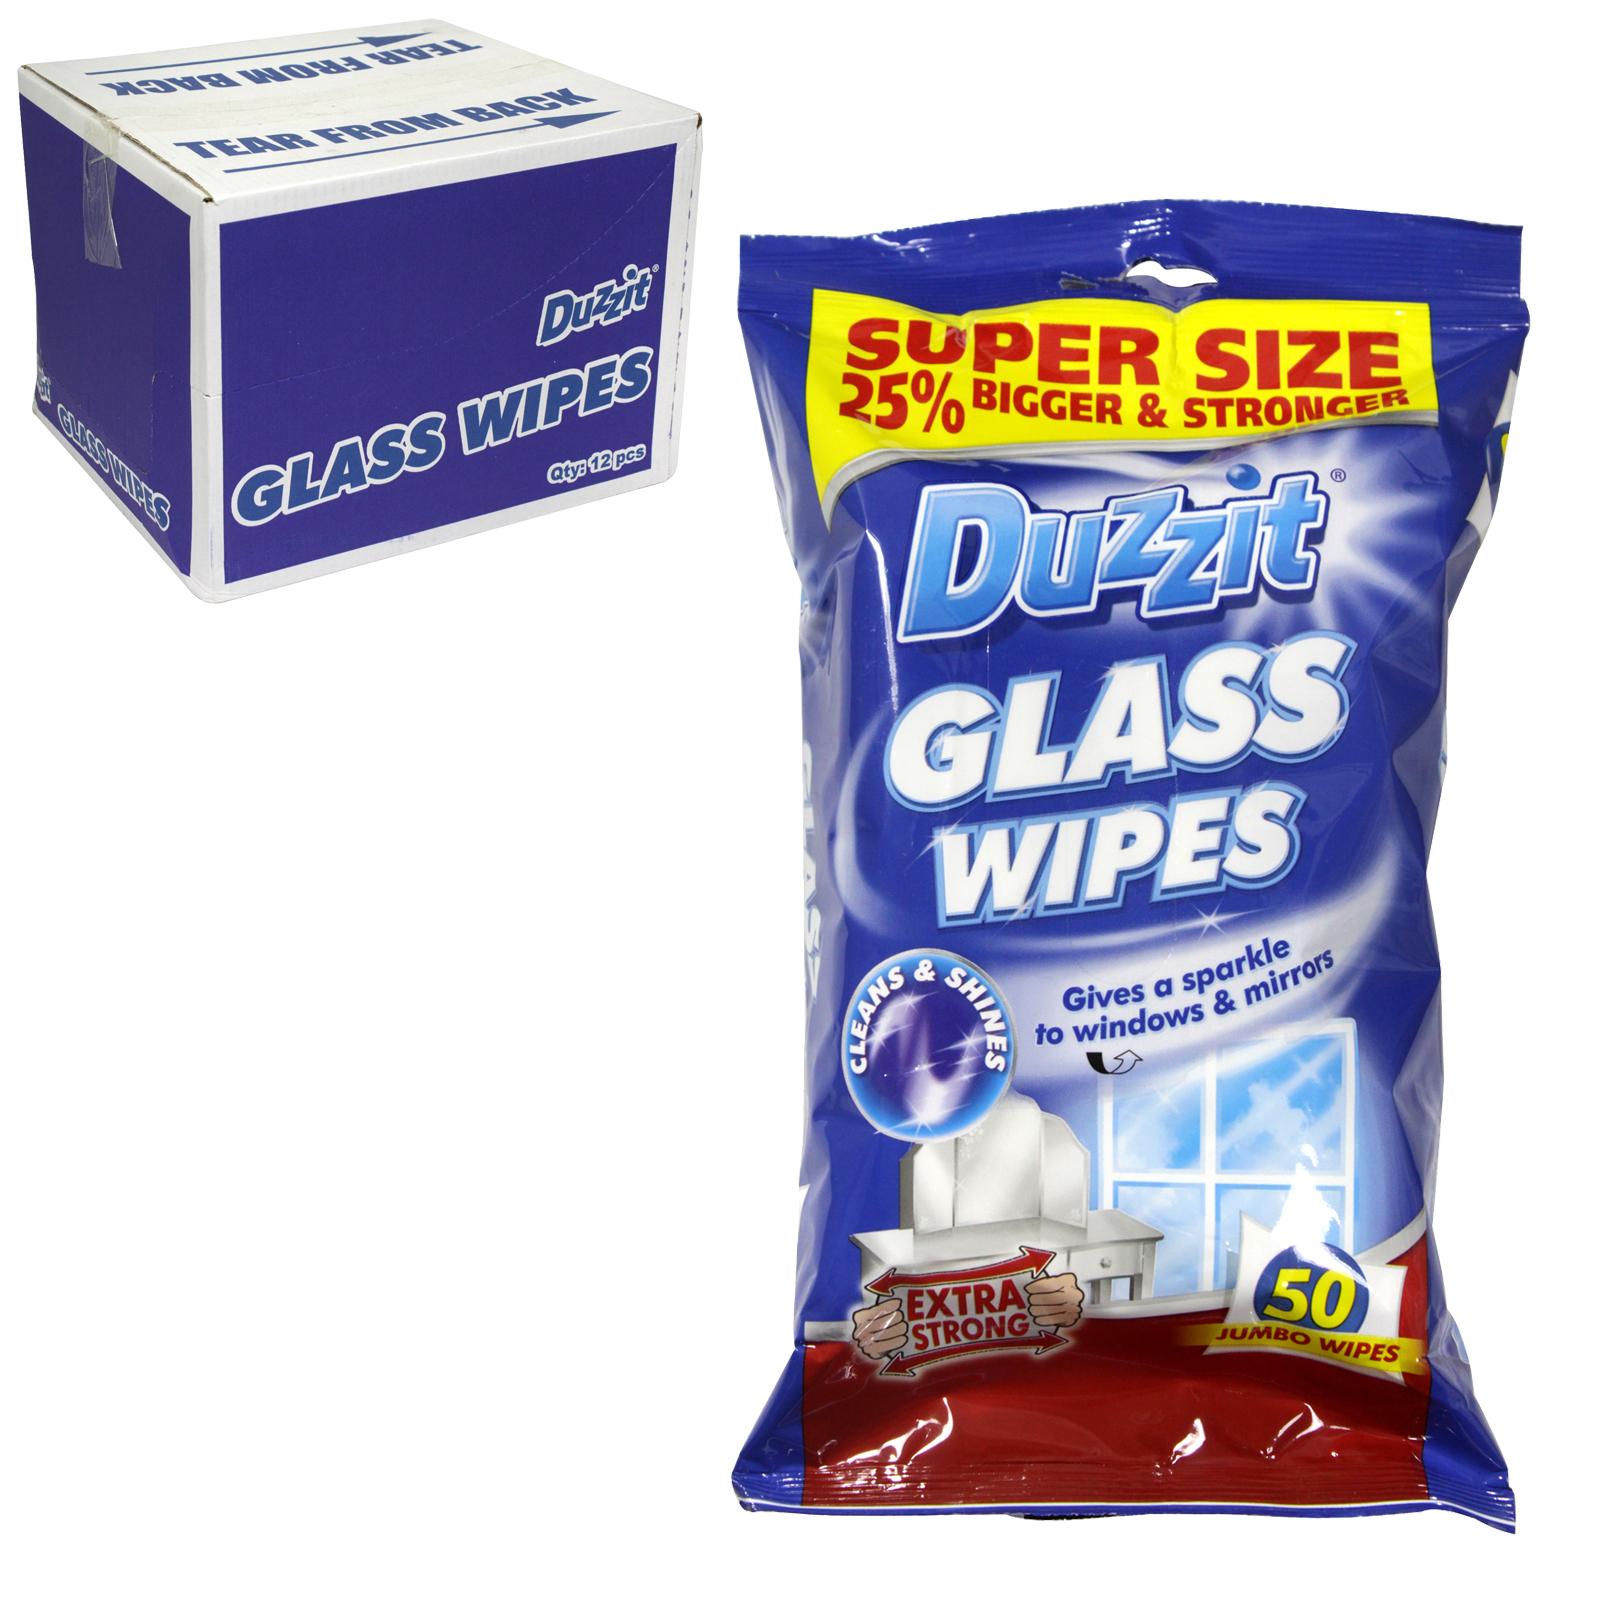 DUZZIT GLASS WIPES 50 JUMBO WIPES X12